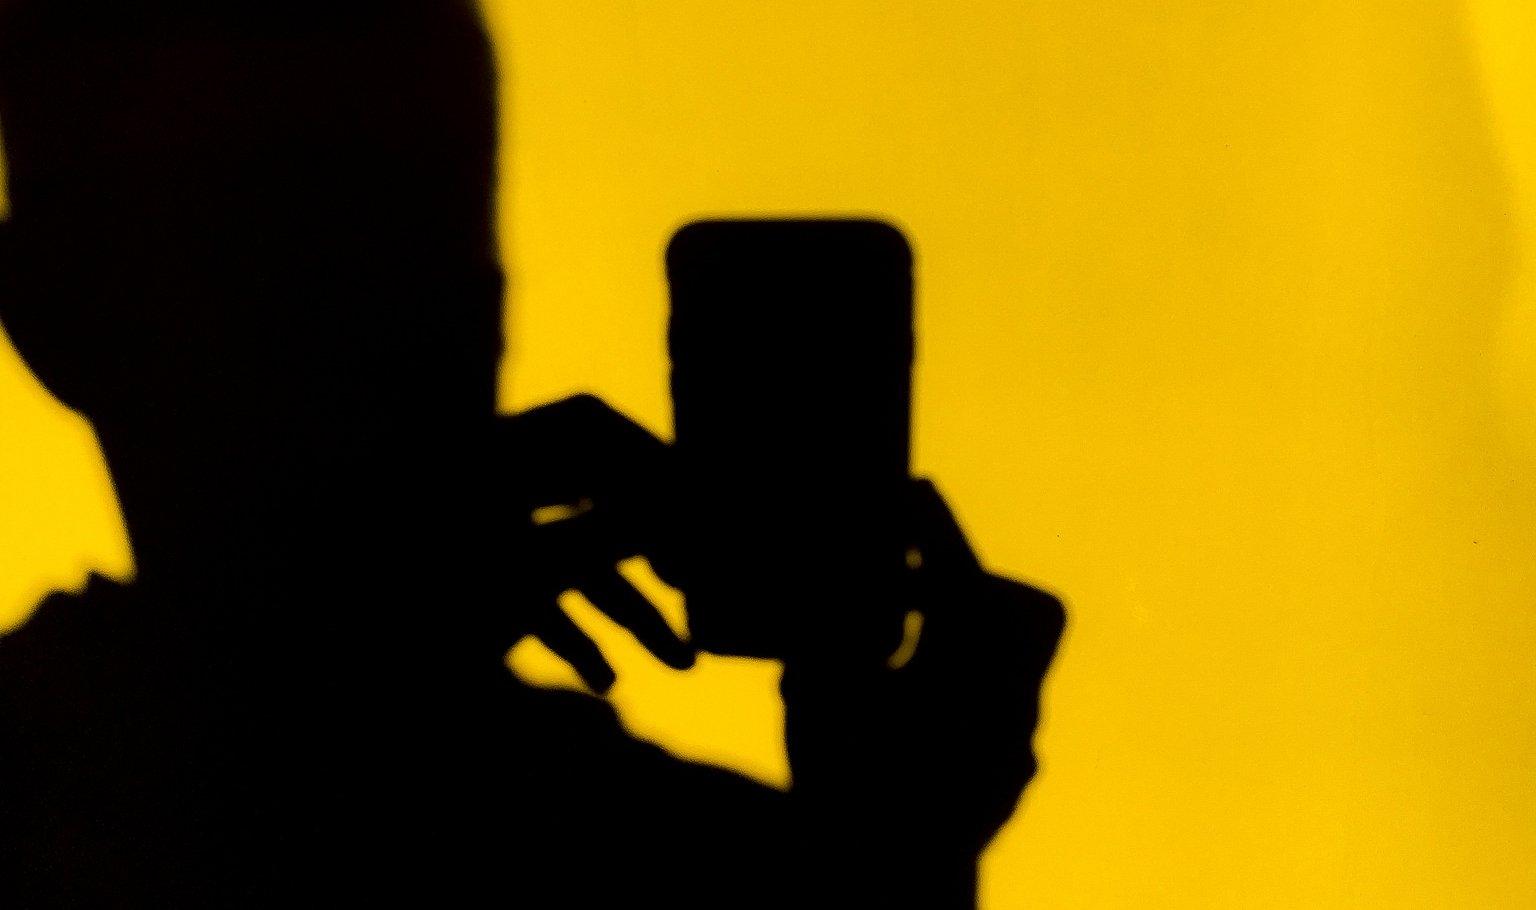 O Estado e as selfies - Por Fernanda Mambrini Rudolfo